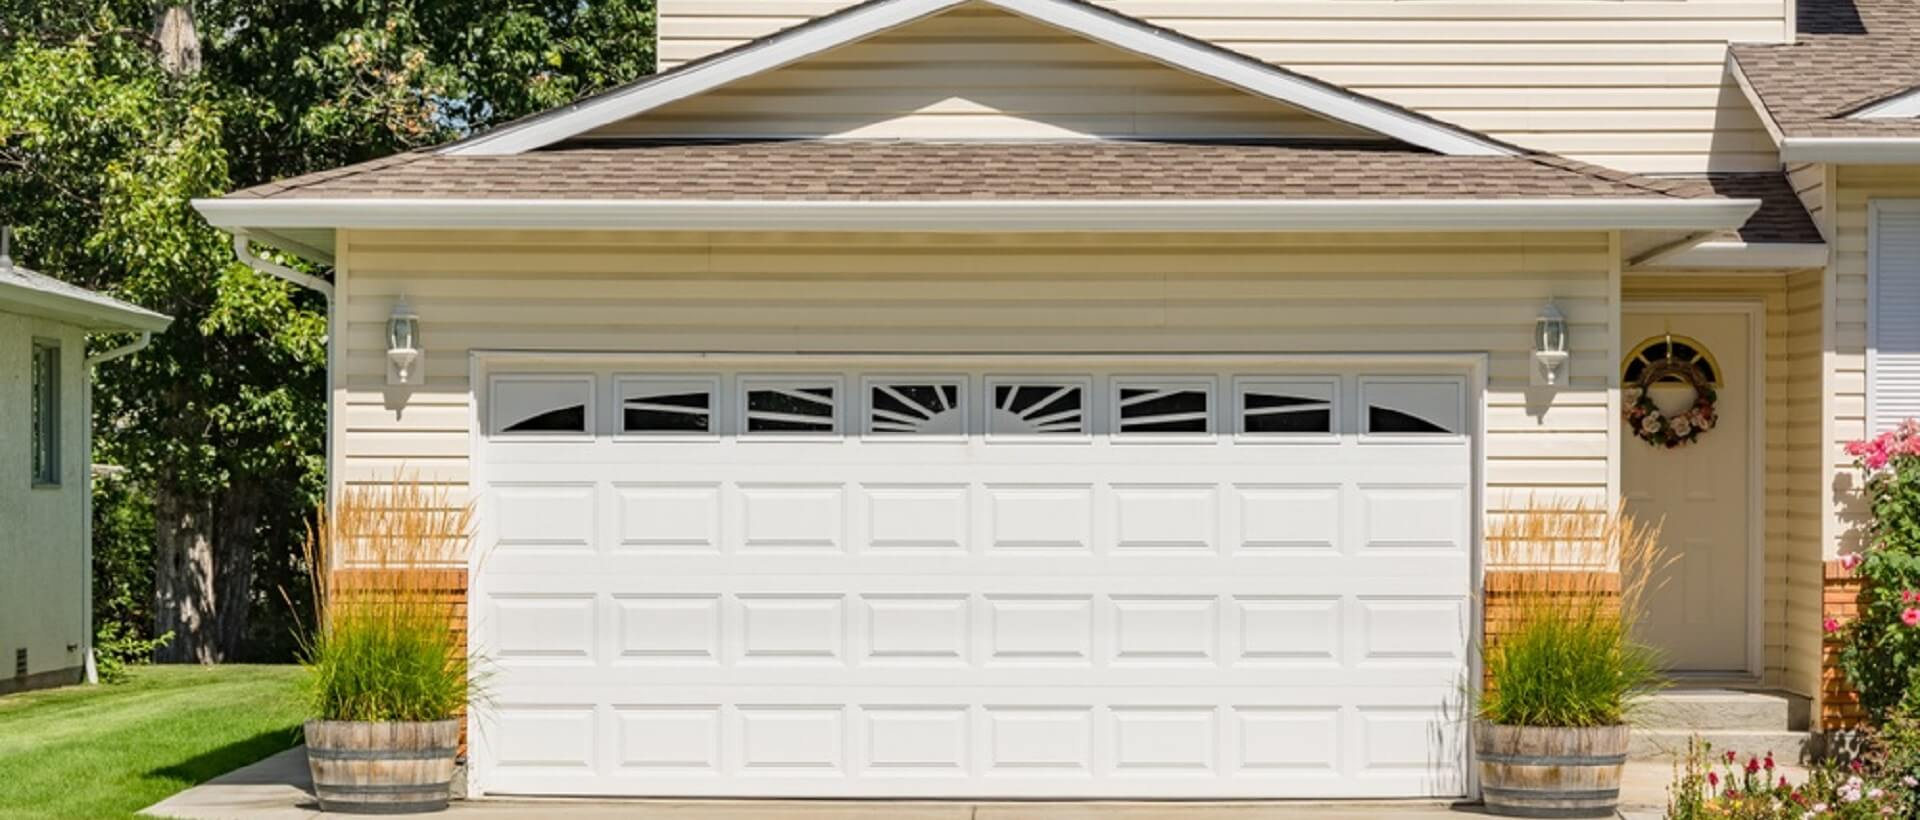 Arvada Garage Doors & Security - Garage doors And locksmith services in CO